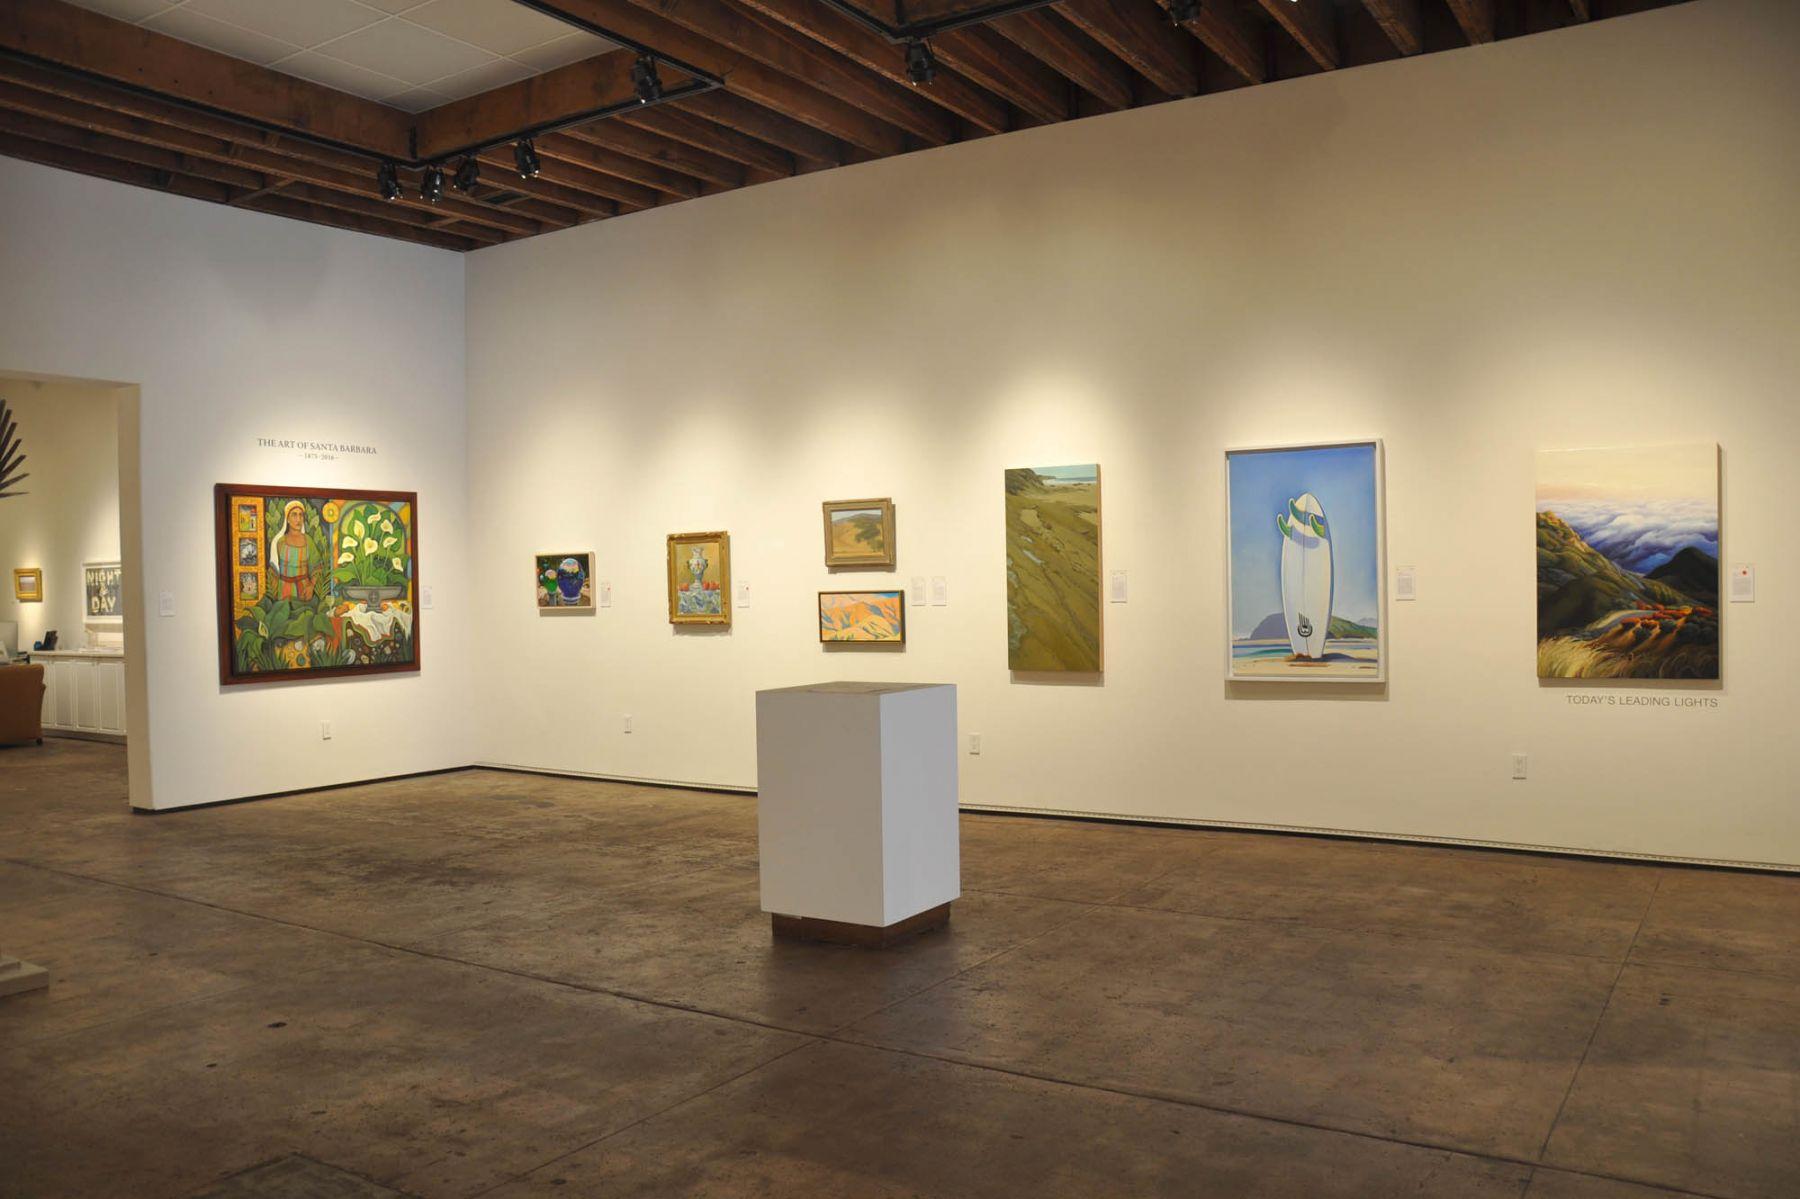 The Art of Santa Barbara, Angela Perko, Patricia Chidlaw, Sarah Vedder, Robin Gowen, Nicole Strasburg, Hank Pitcher, Phoebe Brunner